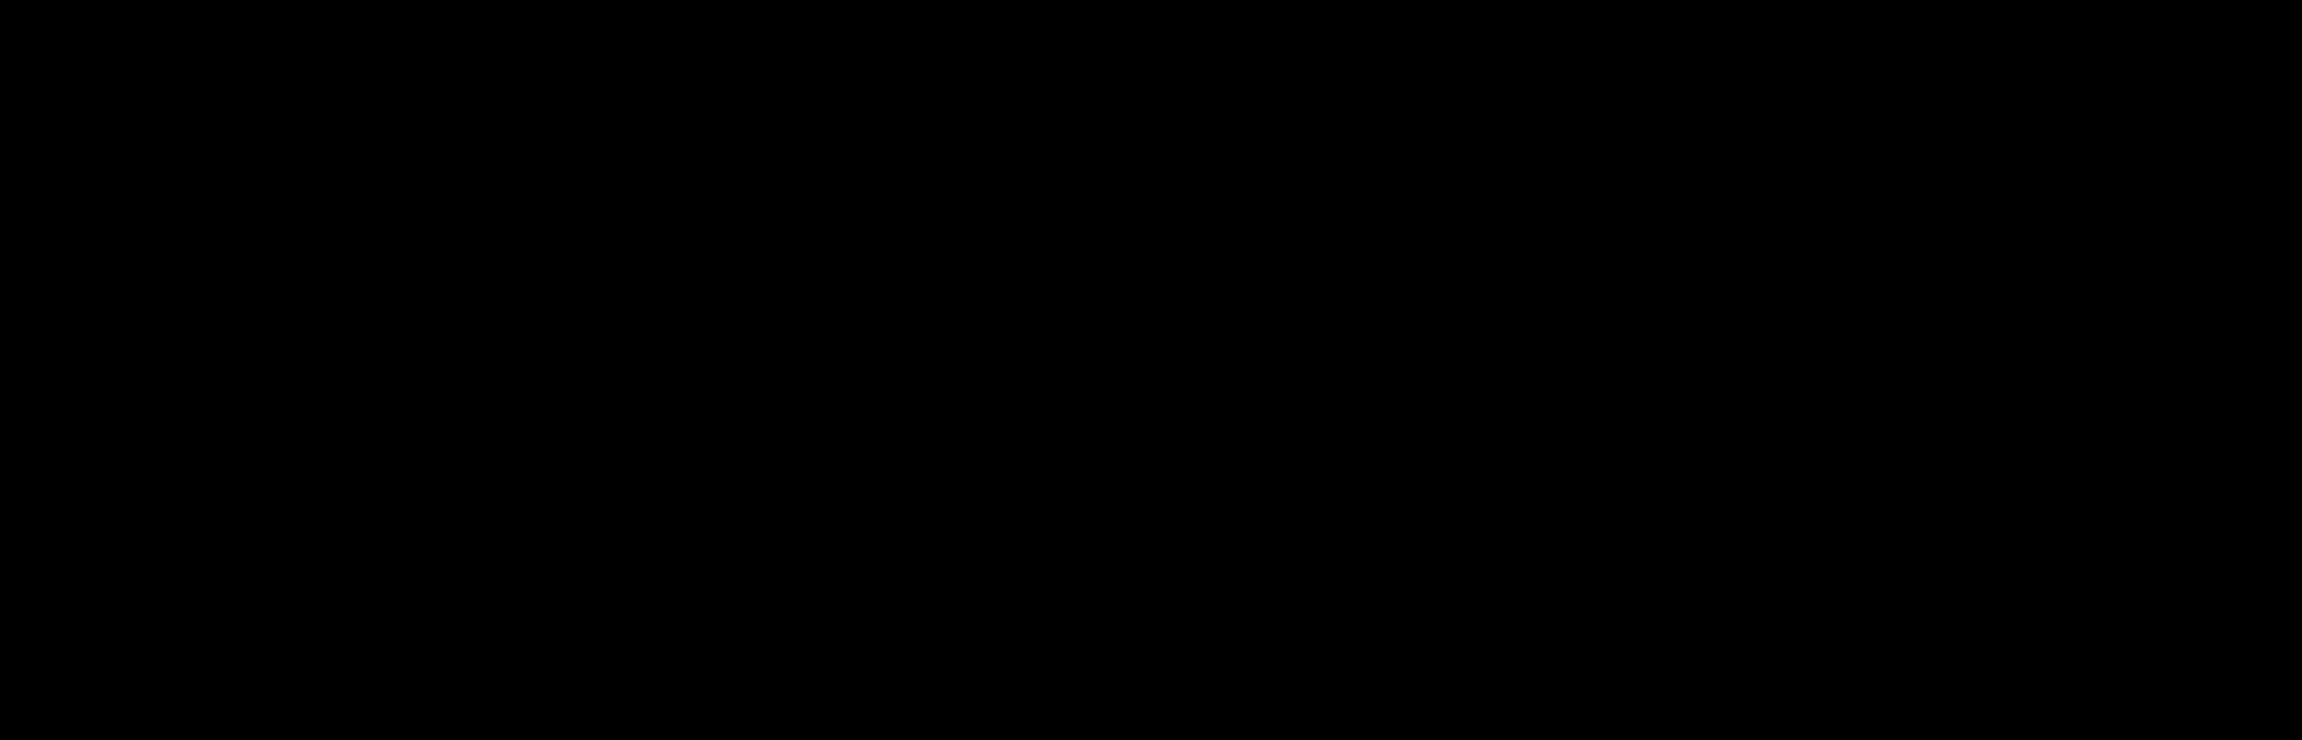 Dehydro aripiprazole-d<sub>8</sub> hydrochloride (piperazine-d<sub>8</sub>)